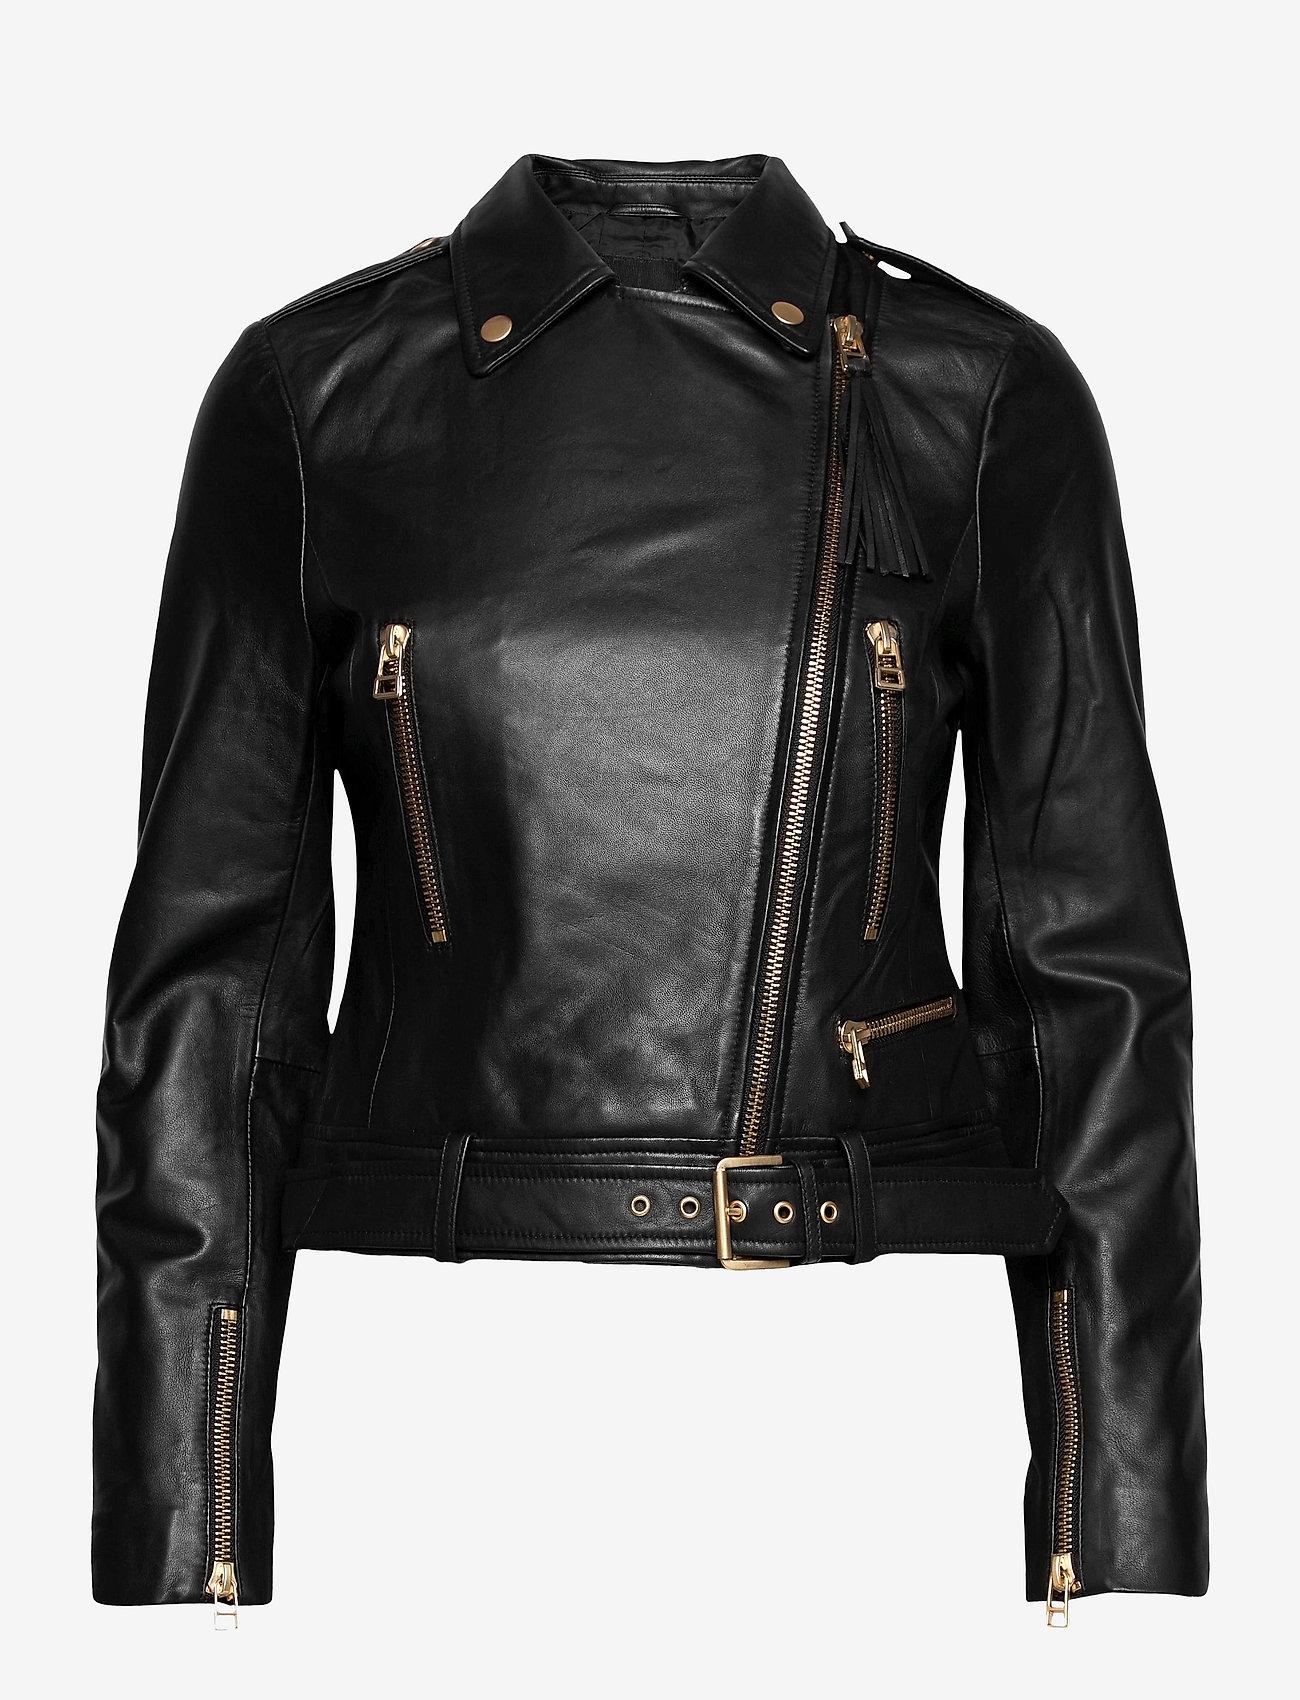 SAND - Soft Lamb Leather - Antille - leren jassen - black - 0